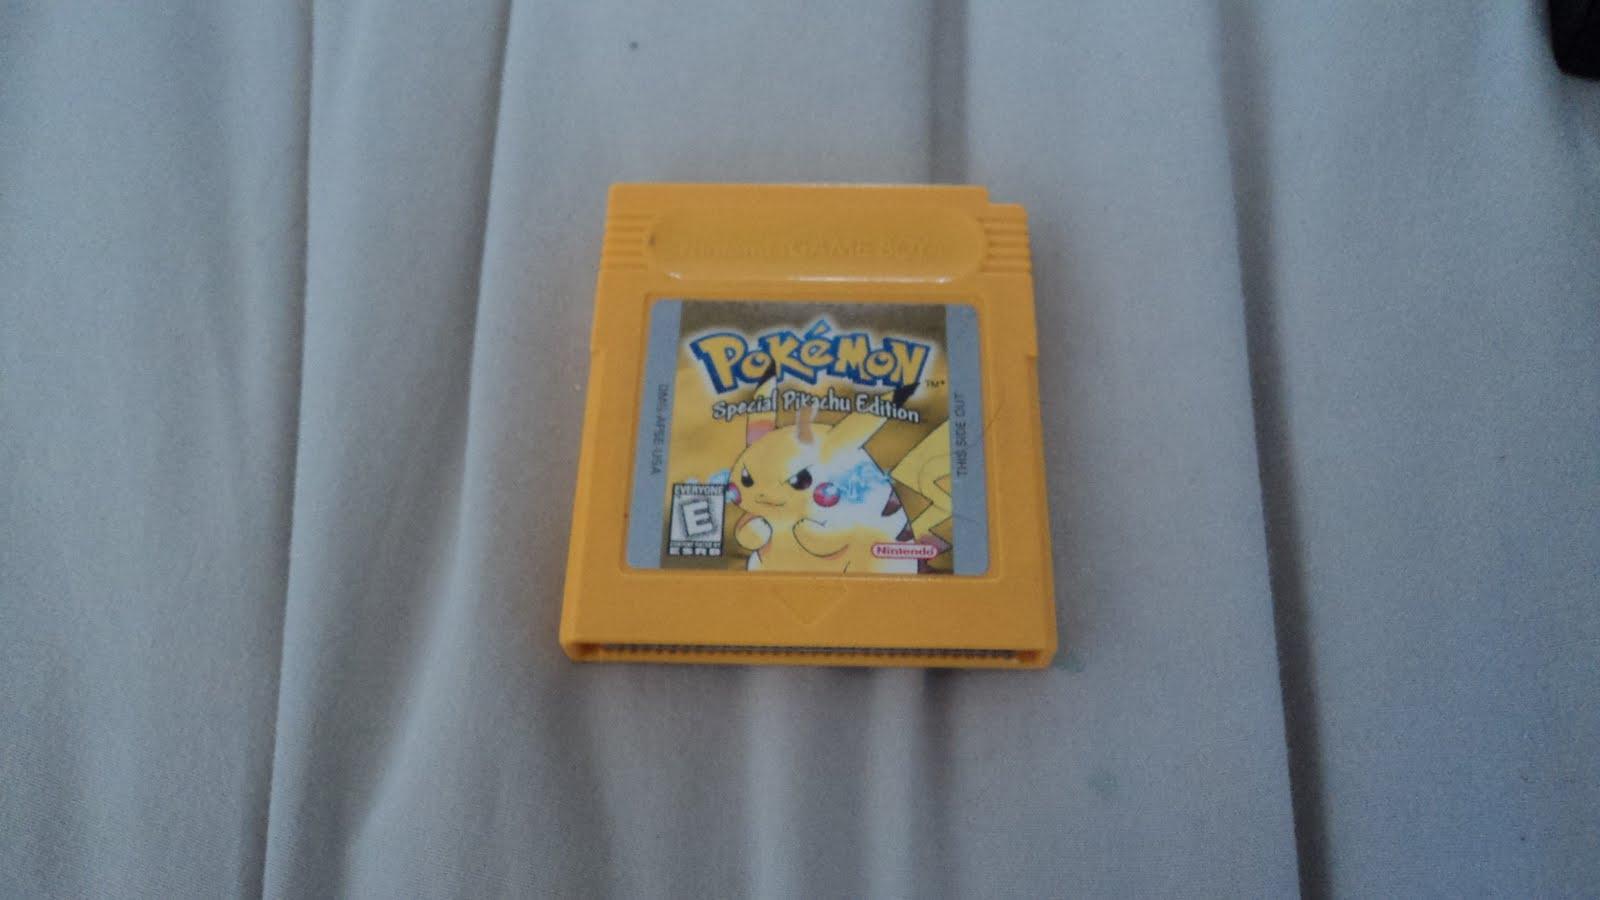 http://1.bp.blogspot.com/-t0OneOr988U/Tsqu3glWqOI/AAAAAAAAHXw/lfSStnzdSBw/s1600/Pokemon%2BPikachu%2Bfor%2BSale.JPG